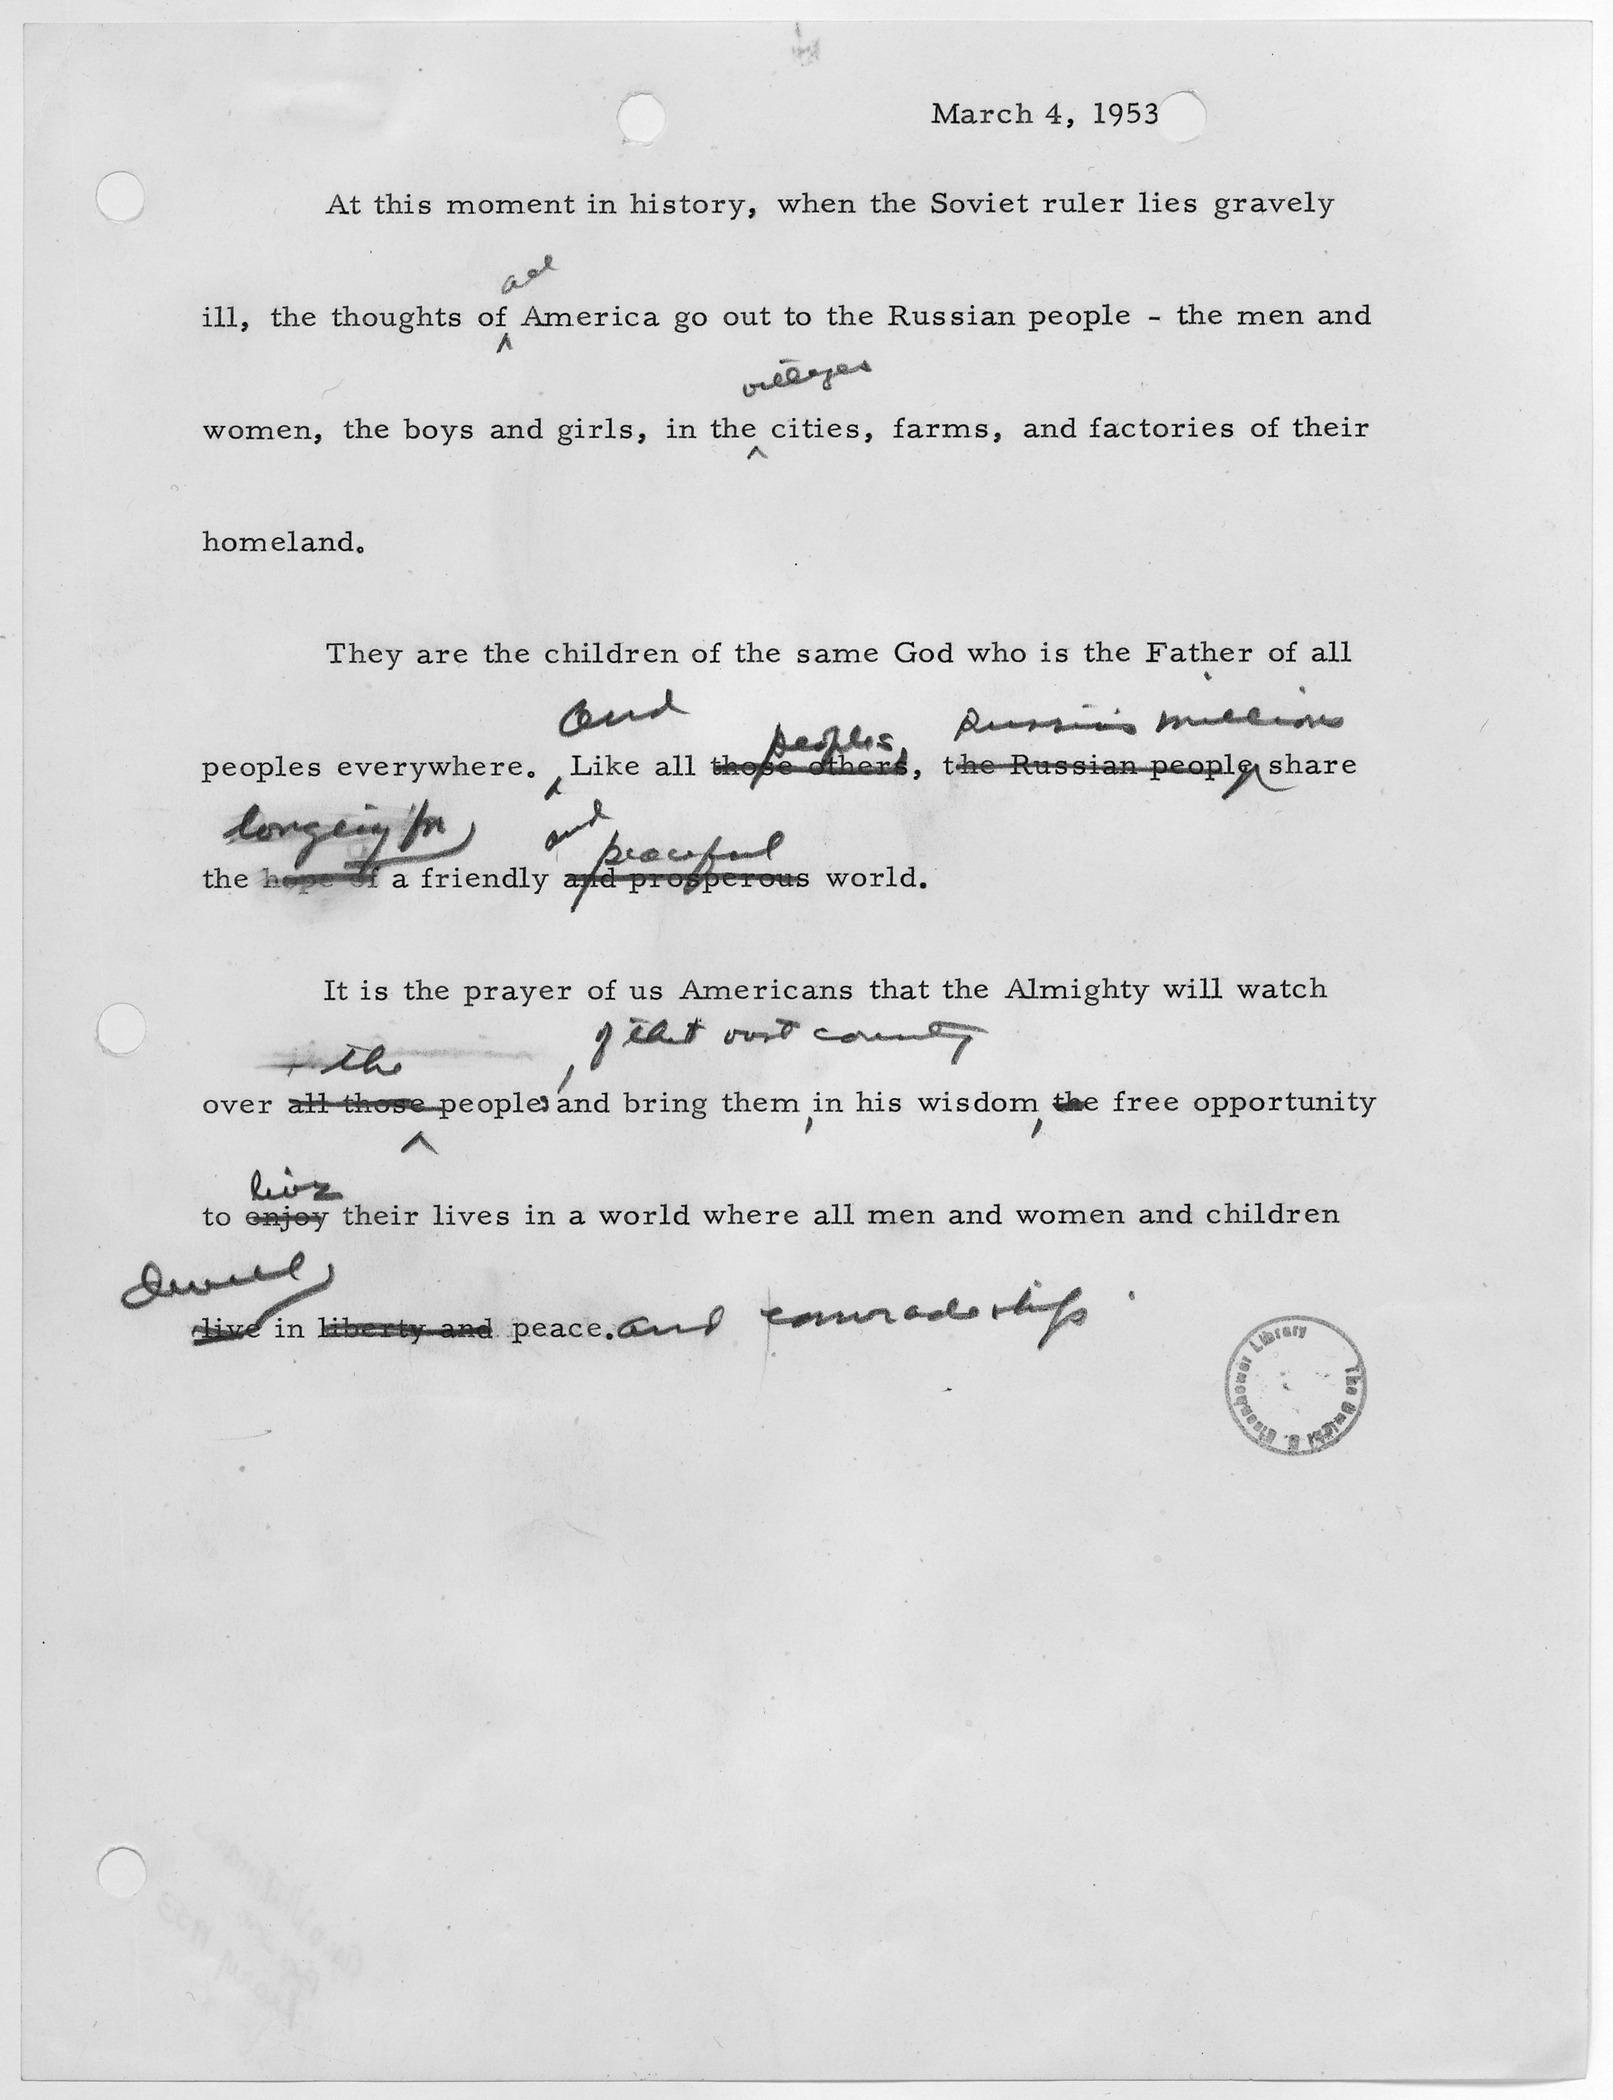 File Draft Statement By President Eisenhower On Joseph Stalin NARA